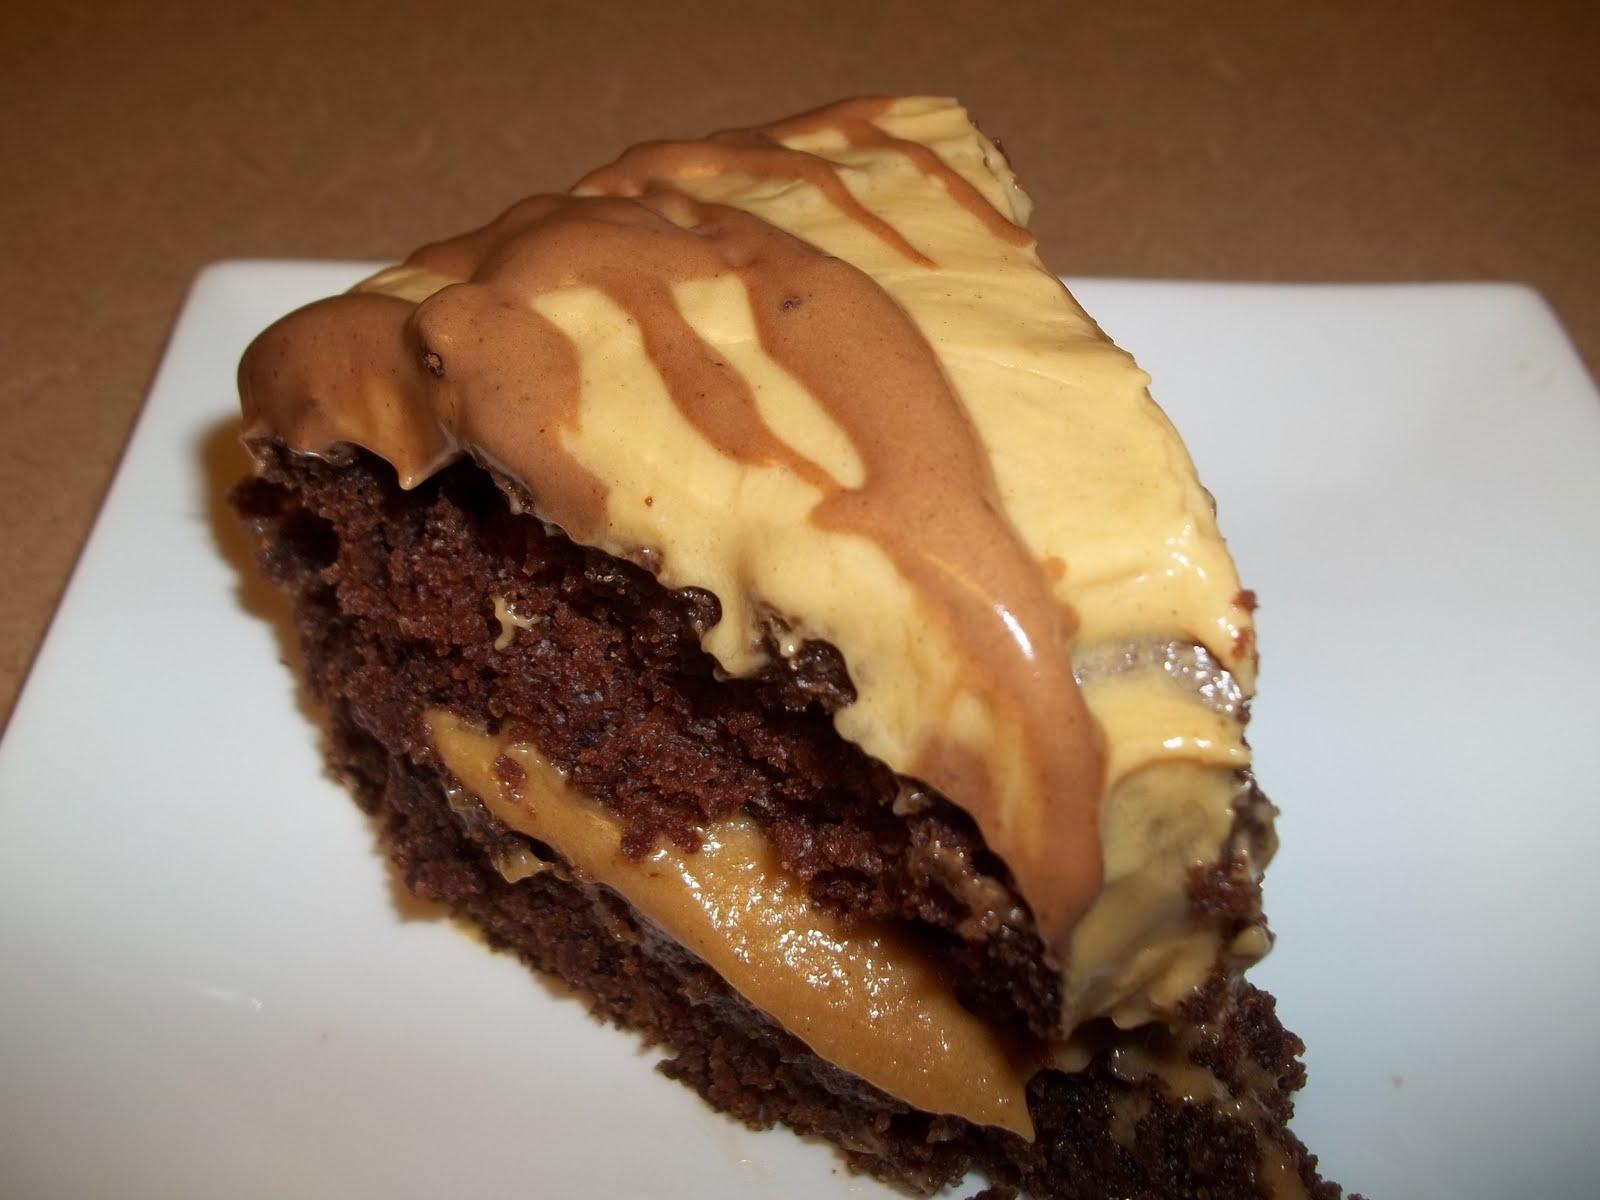 Chocolate Pound Cake with Peanut Butter Glaze Recipe